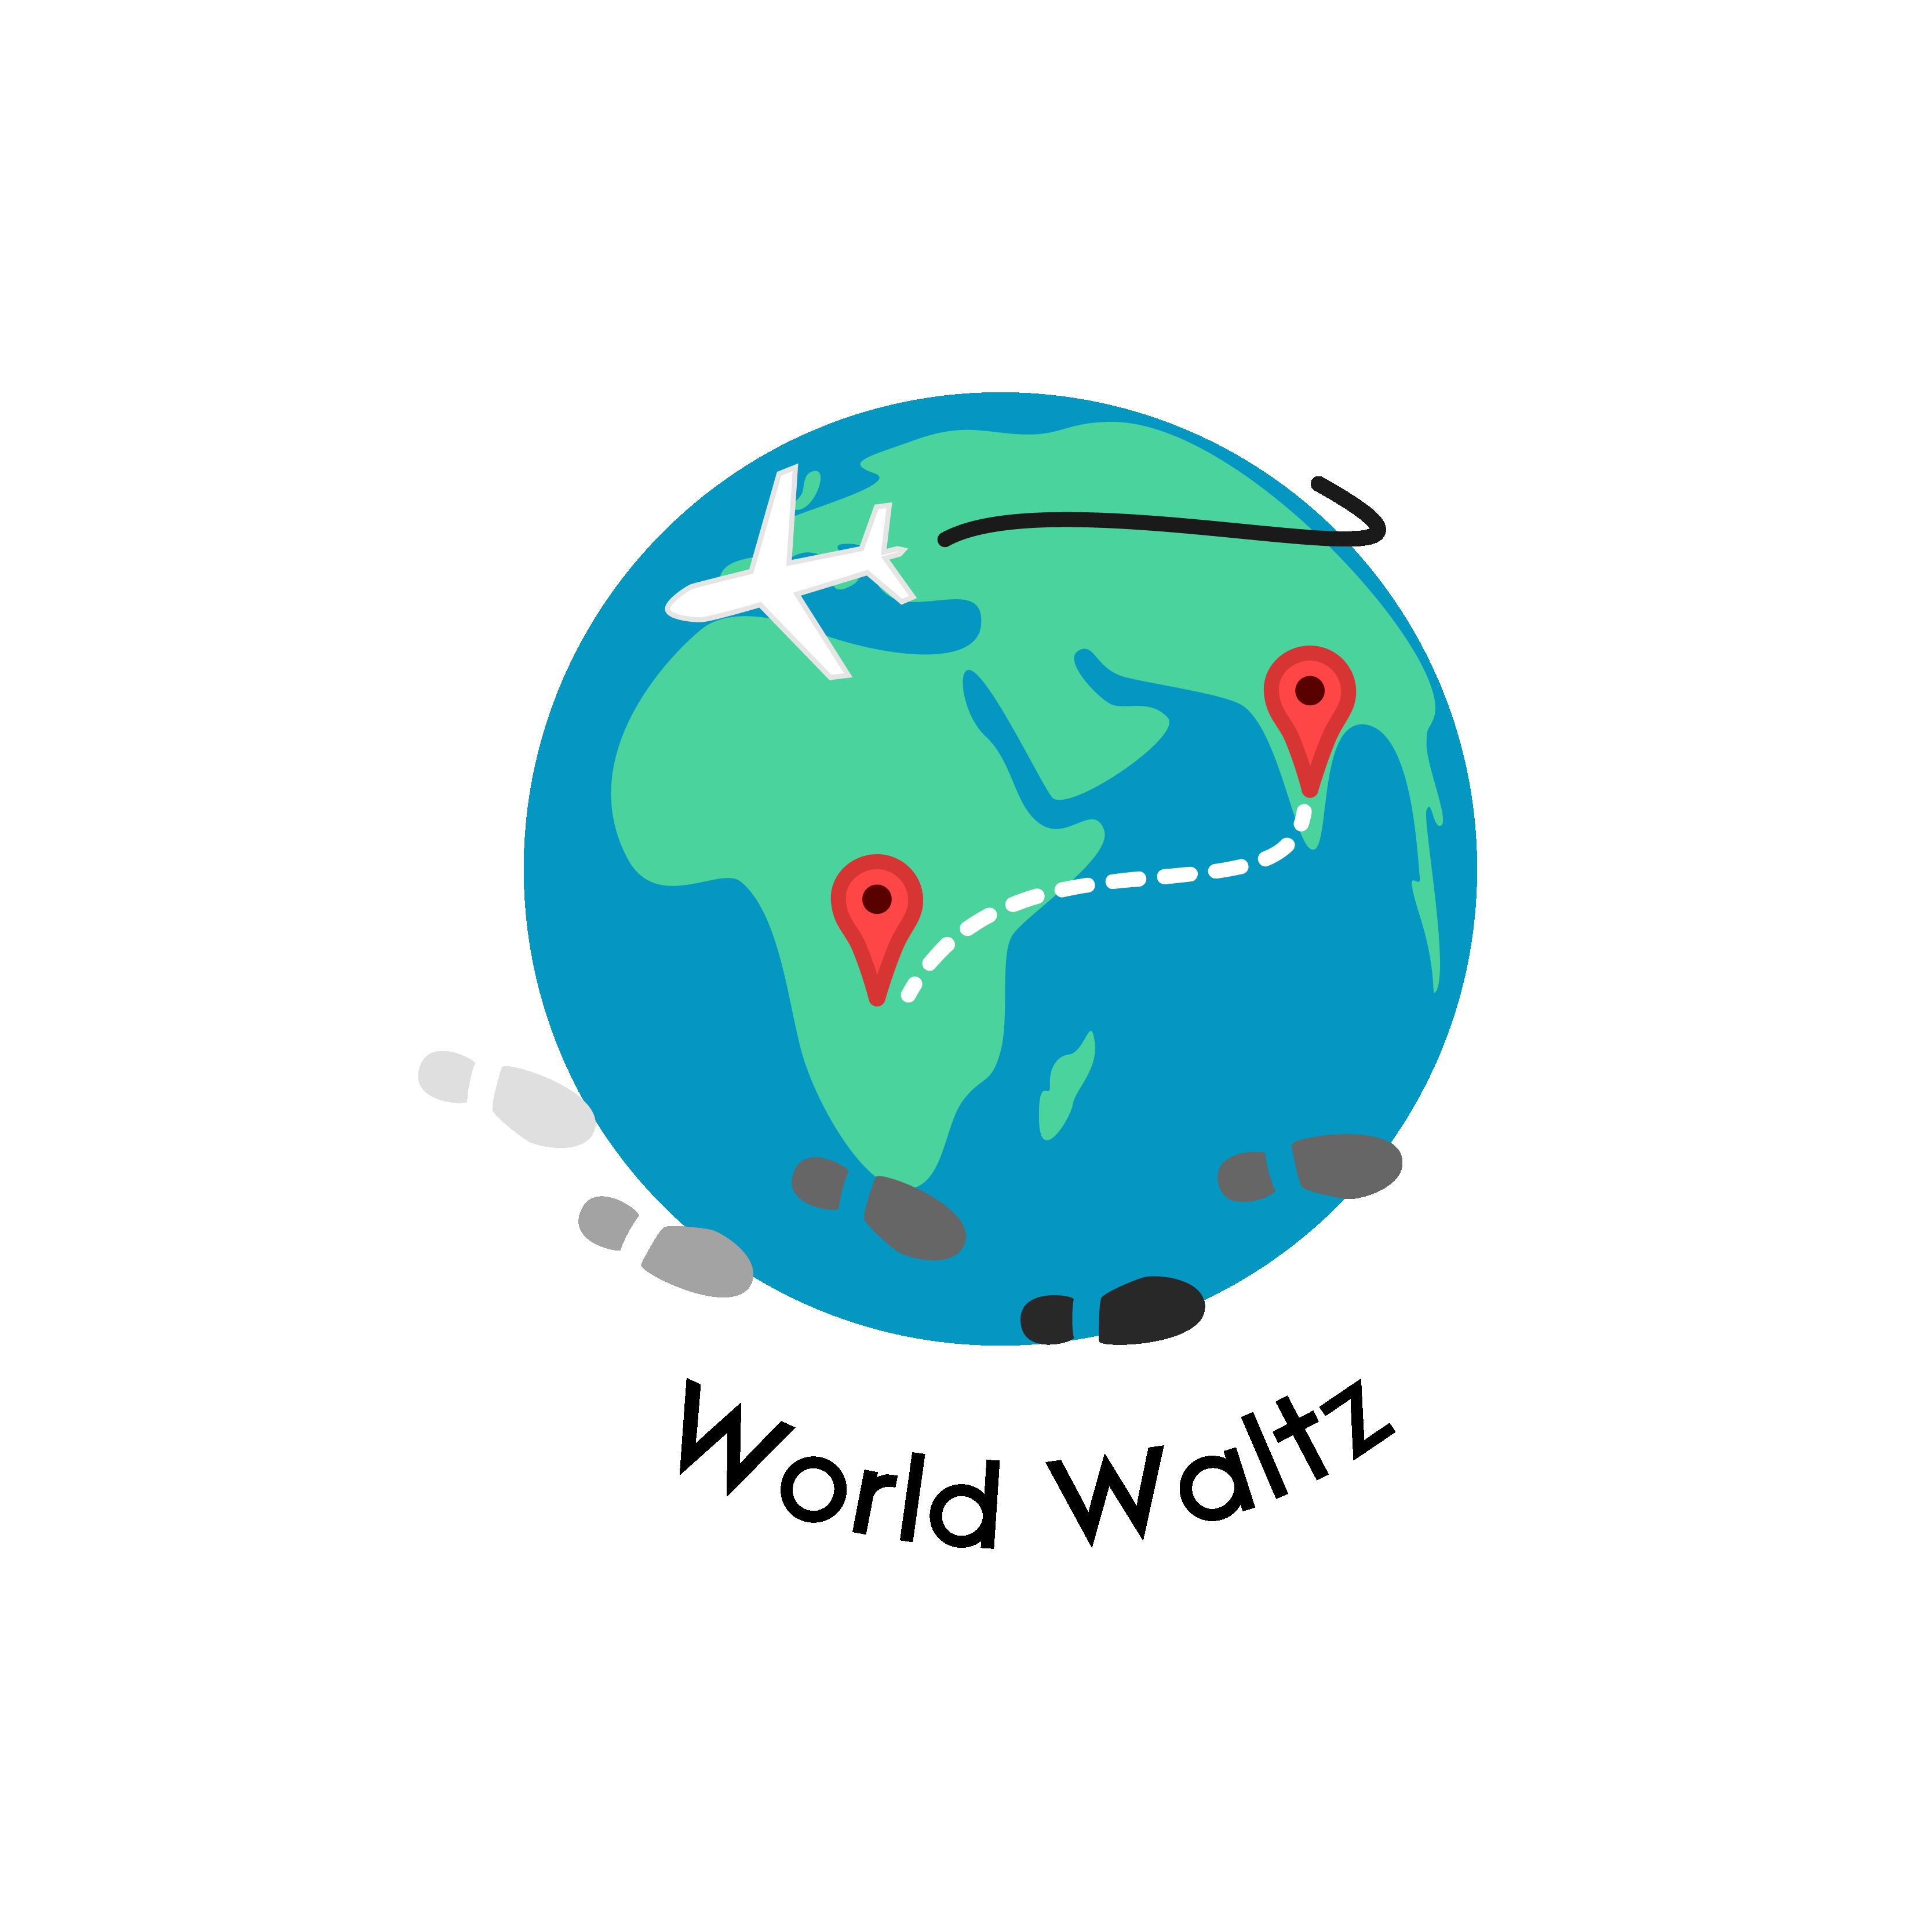 Travelling logo Graphic Designer Vancouver tourism bc | Monika Szucs